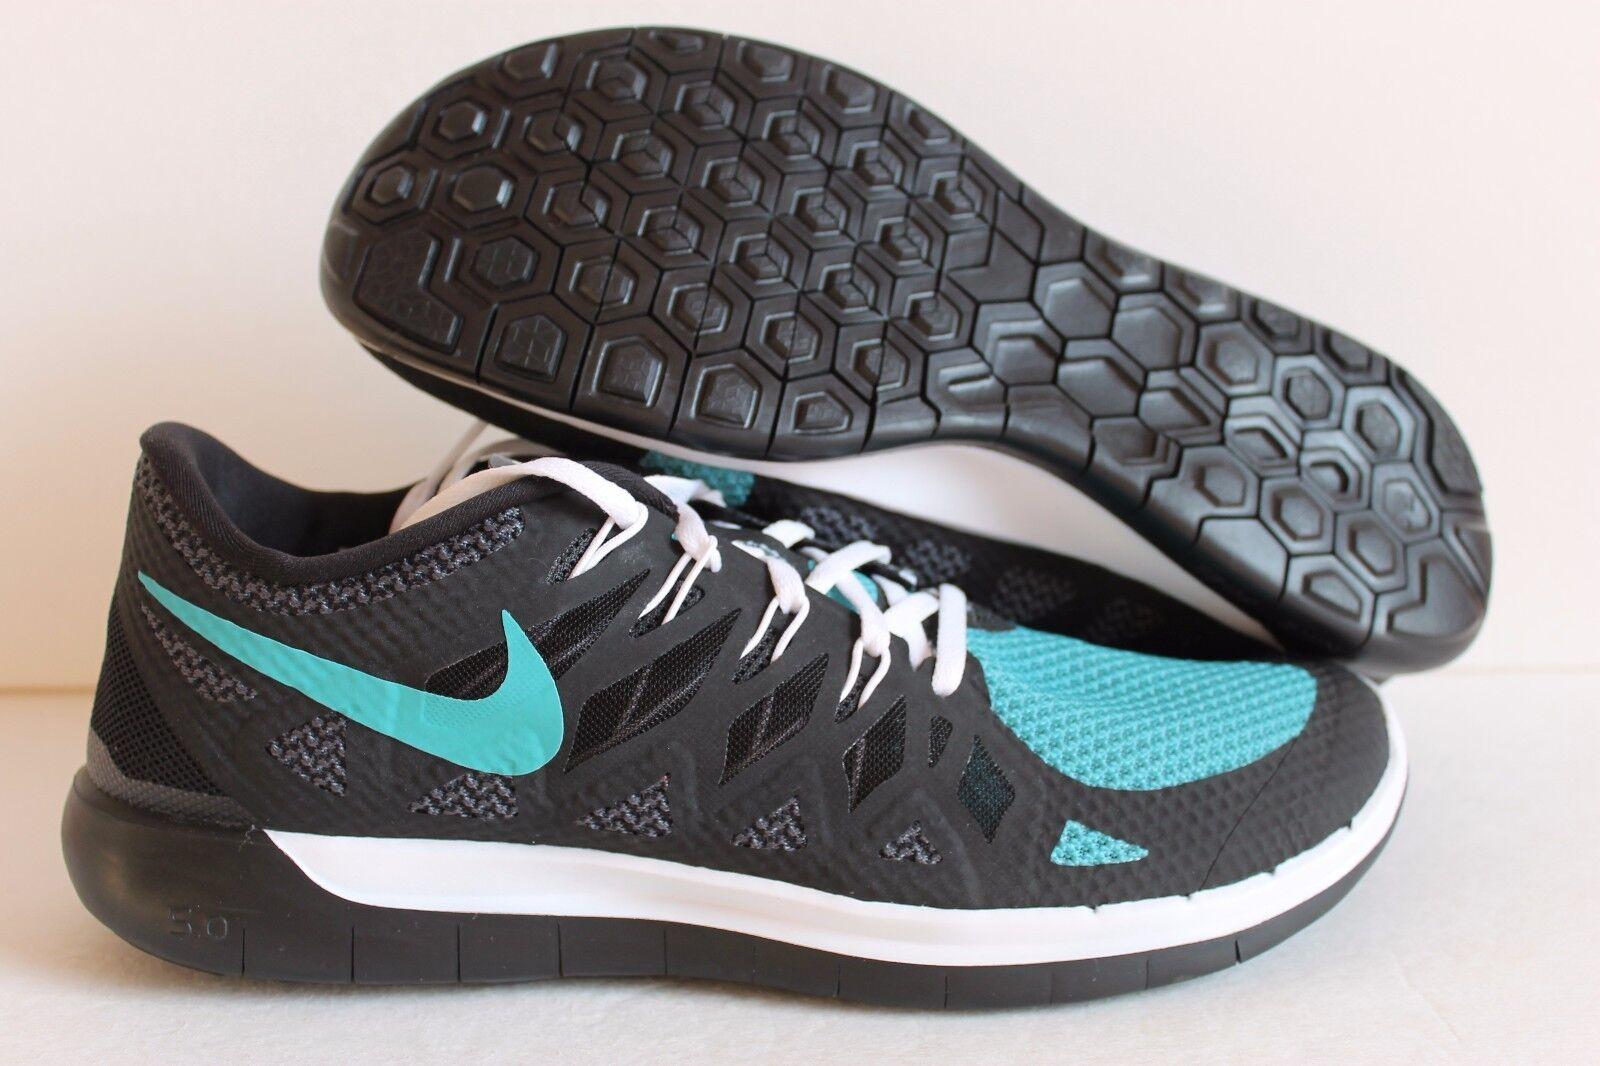 Nike ID Hombre Free Run 5.0 ID Nike Negro/Neo Turquesa [653713-992] 55fae7